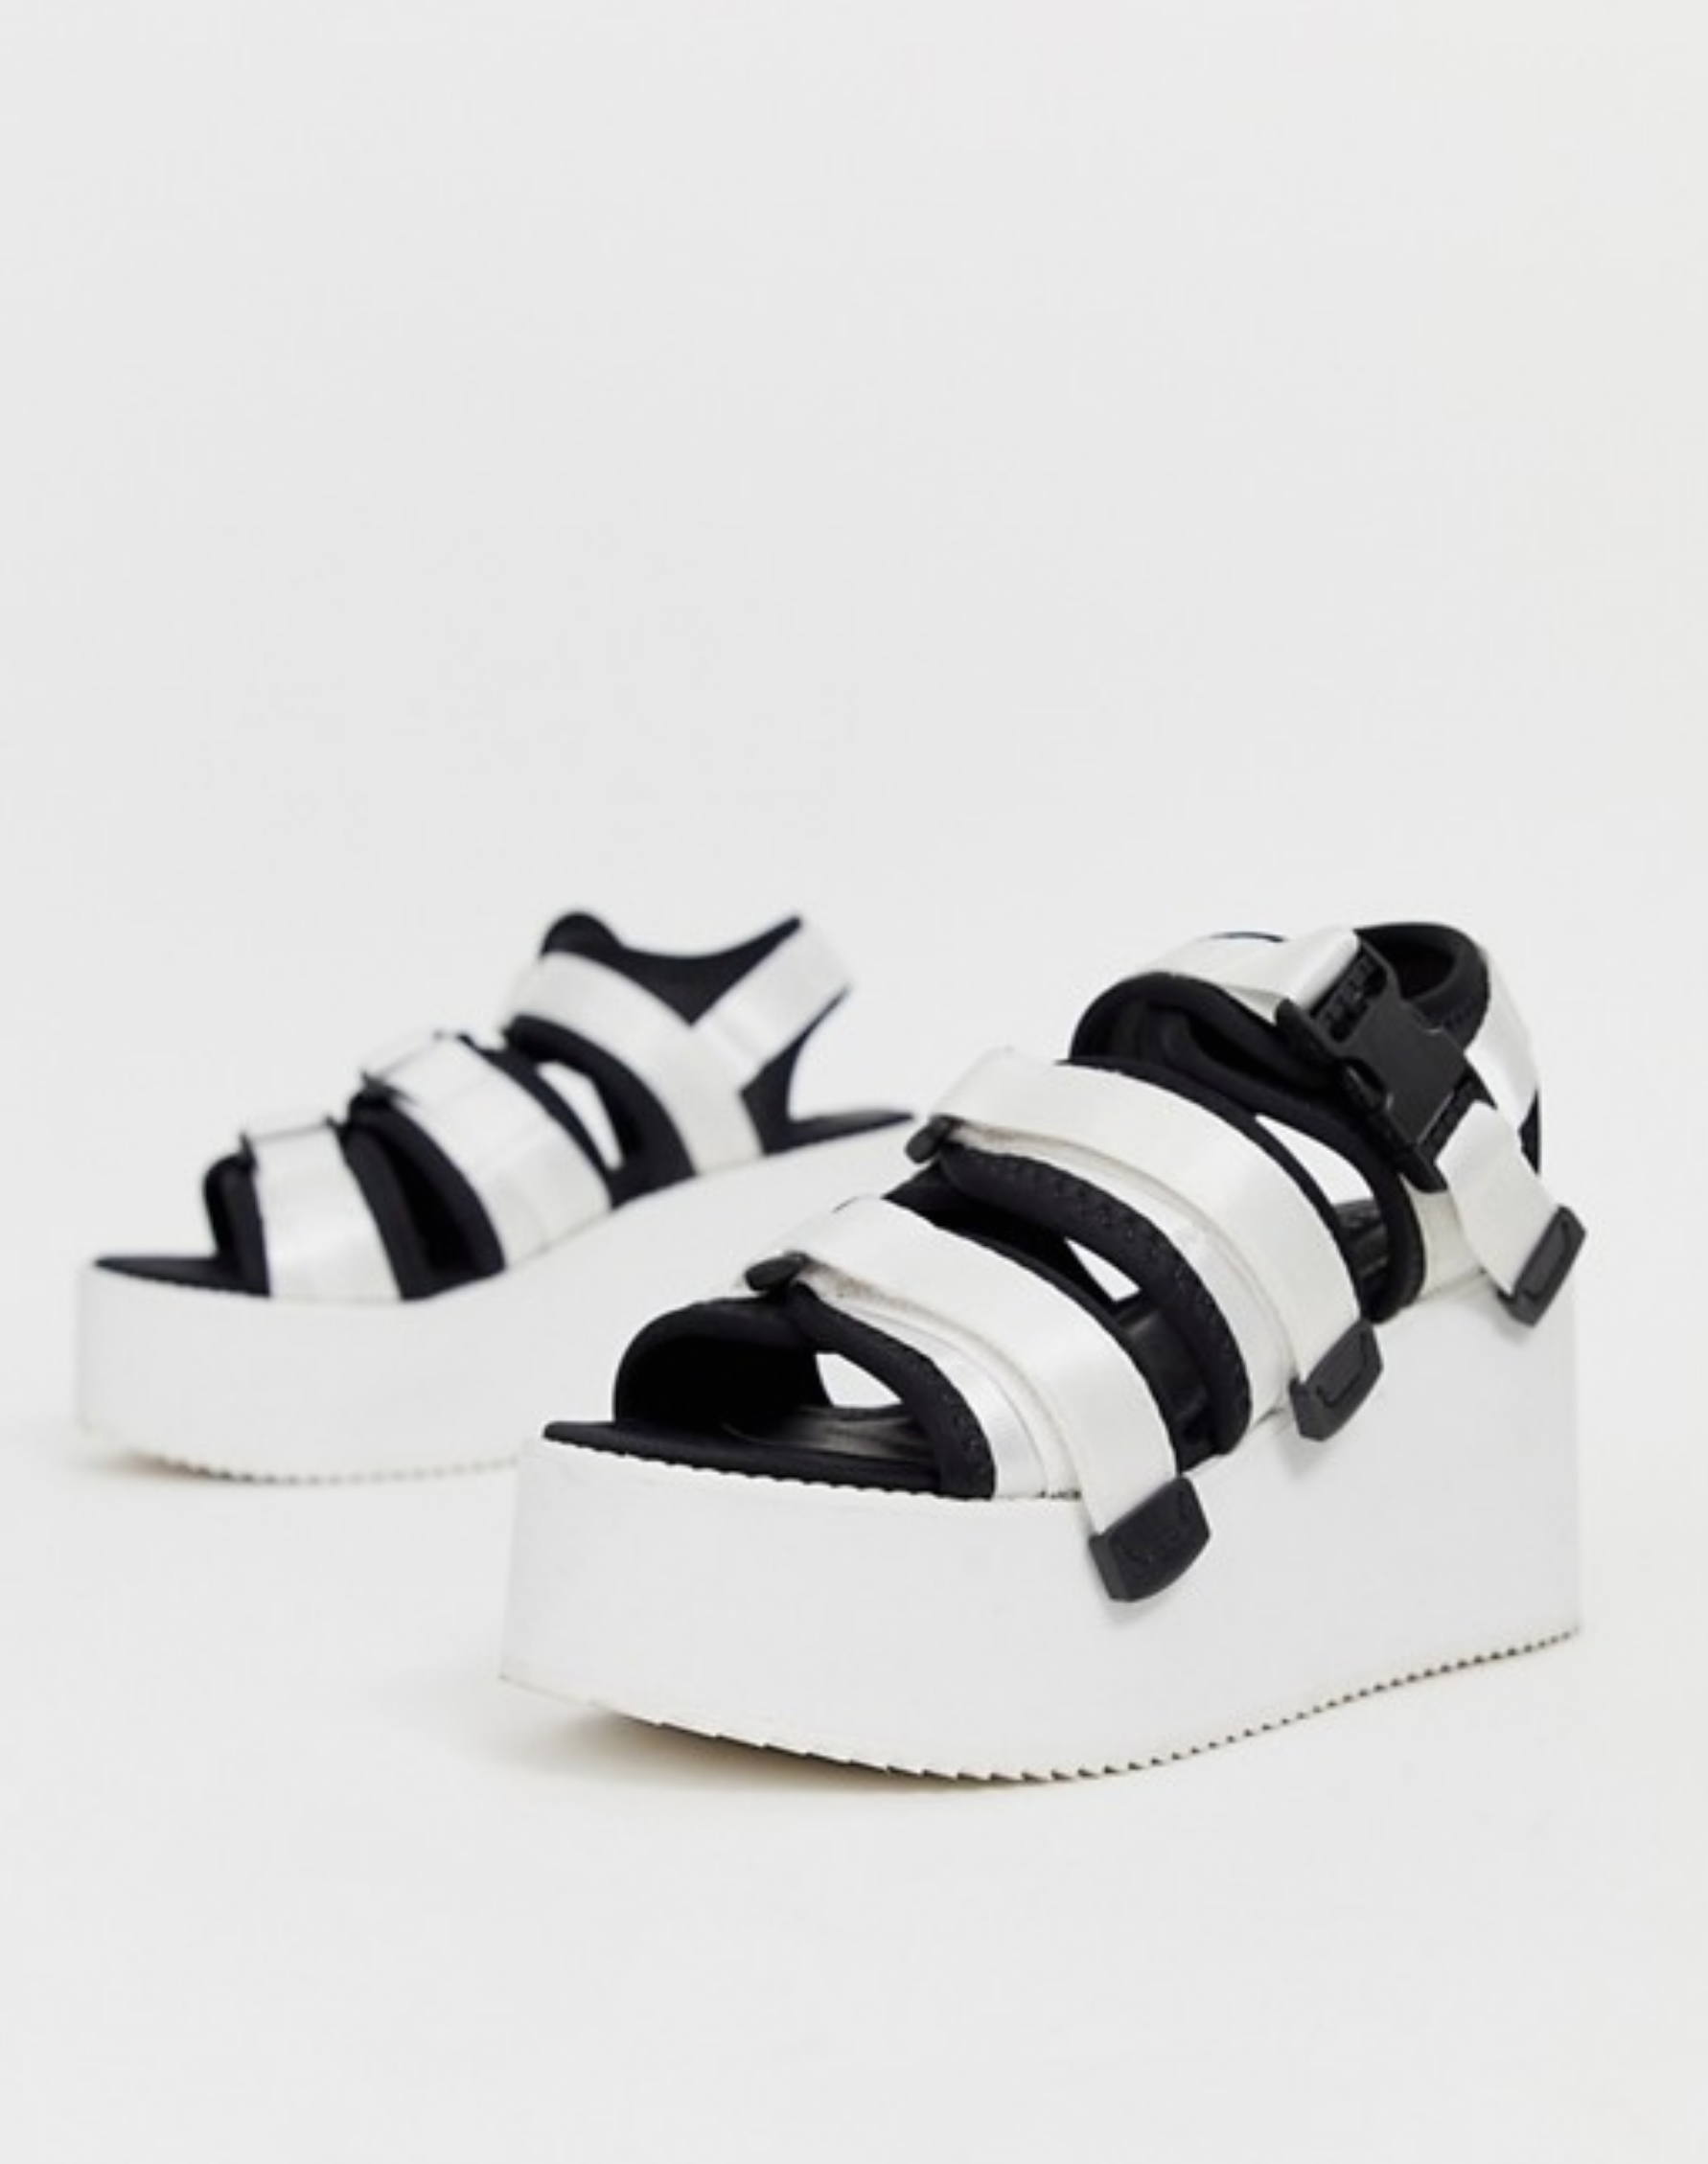 03d751abb95 Blink + Platform Wedge Sandals